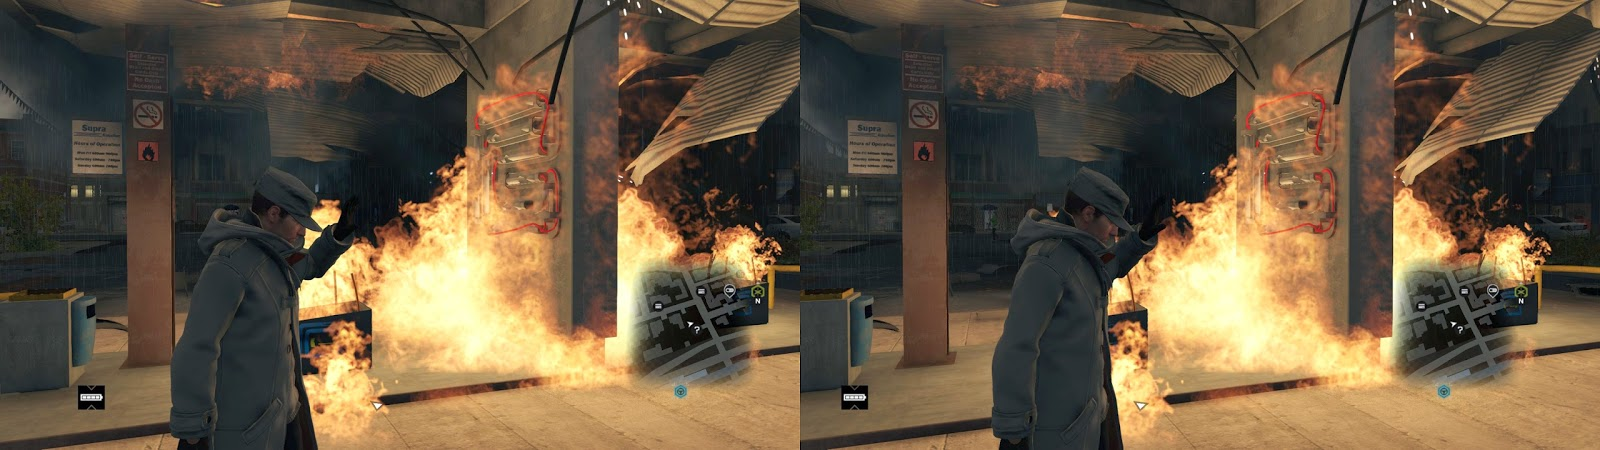 Helix Mod: Watch Dogs - DX11 3DMigoto 3D Vision Fix